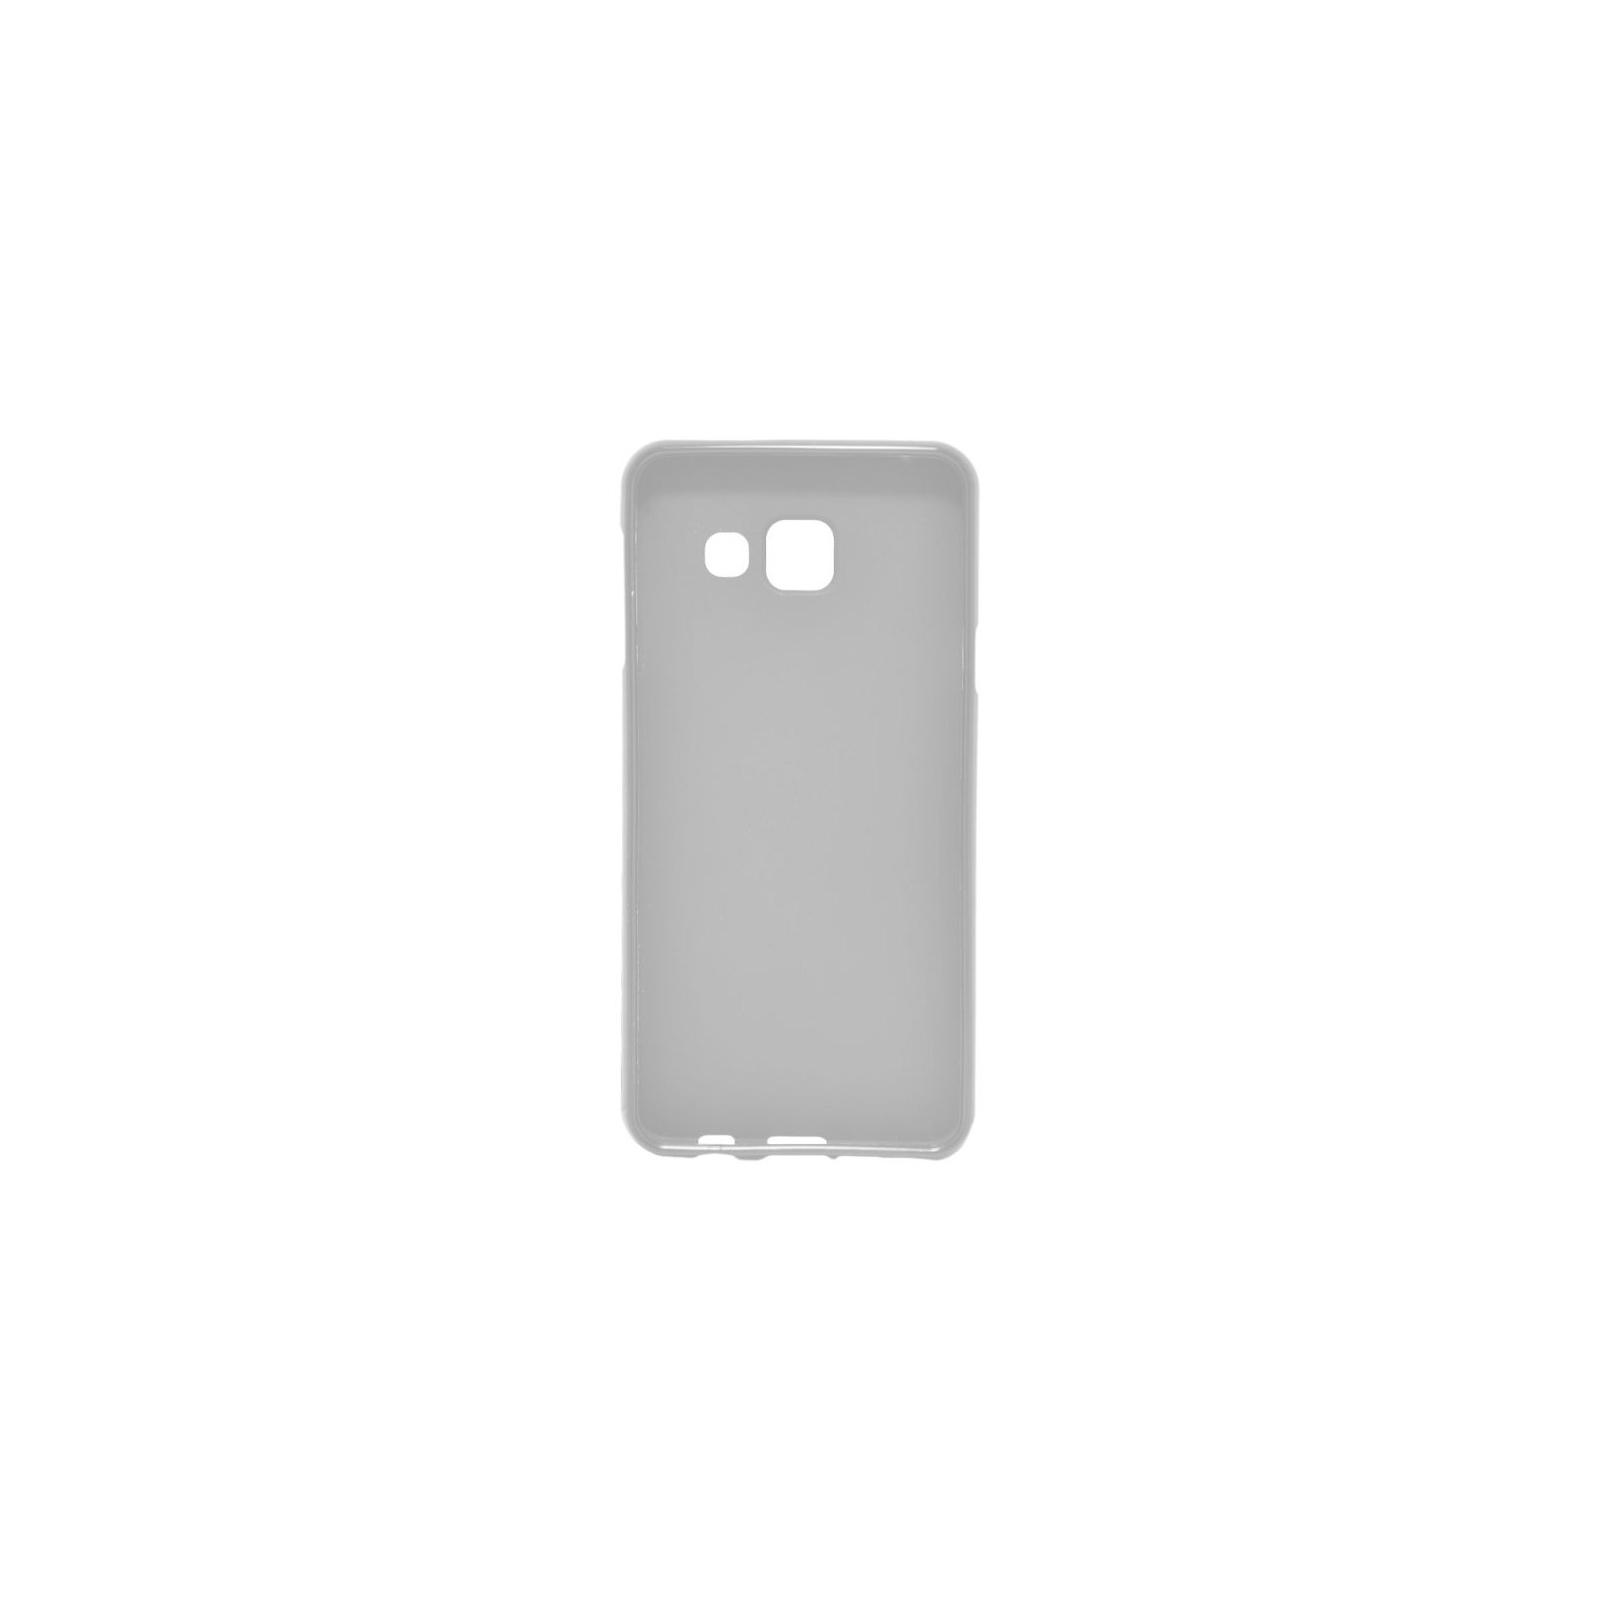 Чехол для моб. телефона Pro-case для Samsung Galaxy A3 (A310) White (CP-305-WHT) (CP-305-WHT)